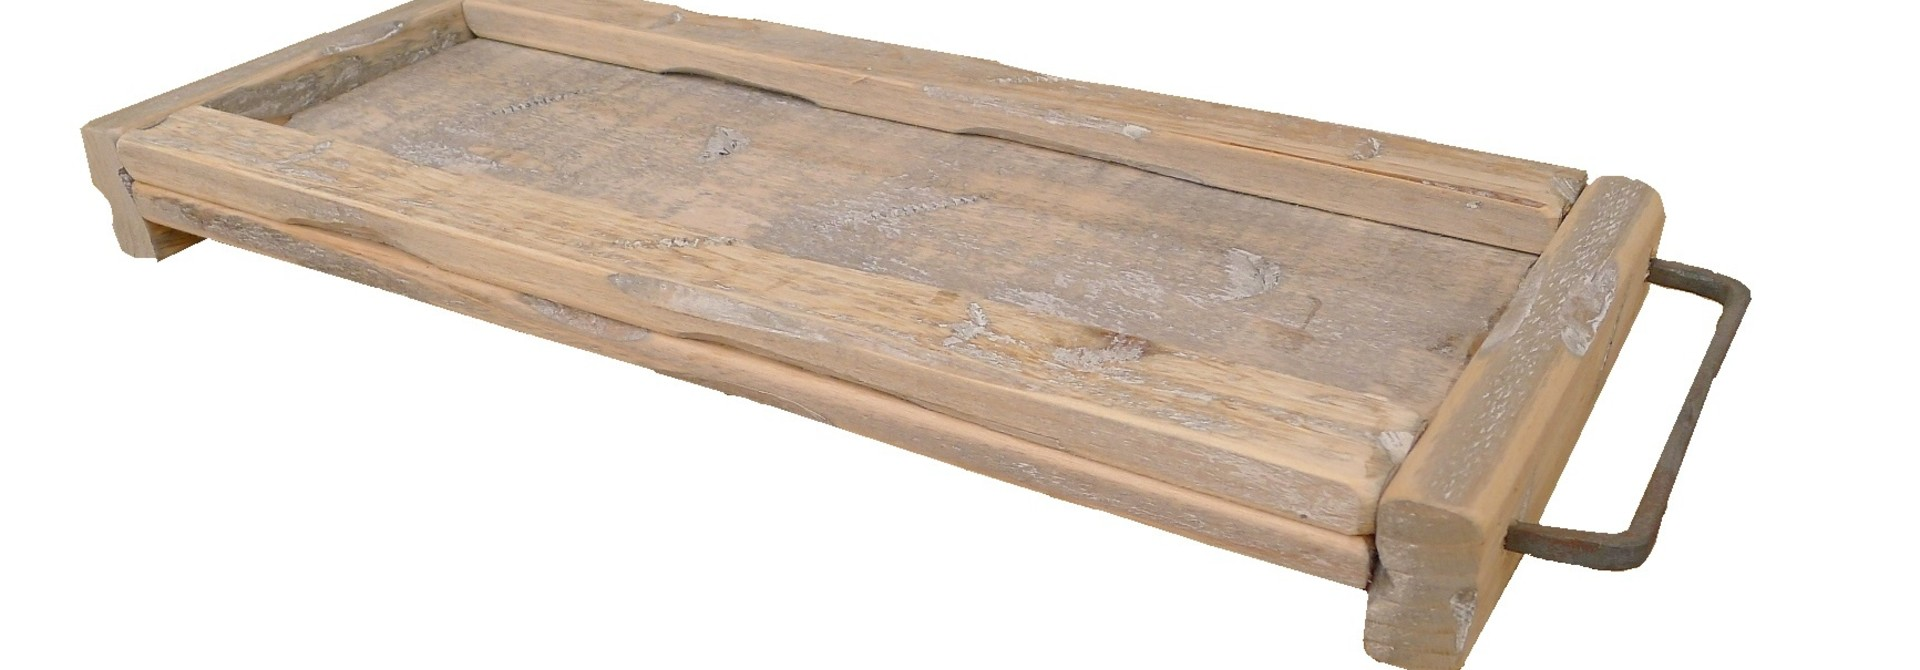 tray old dutchempress 40